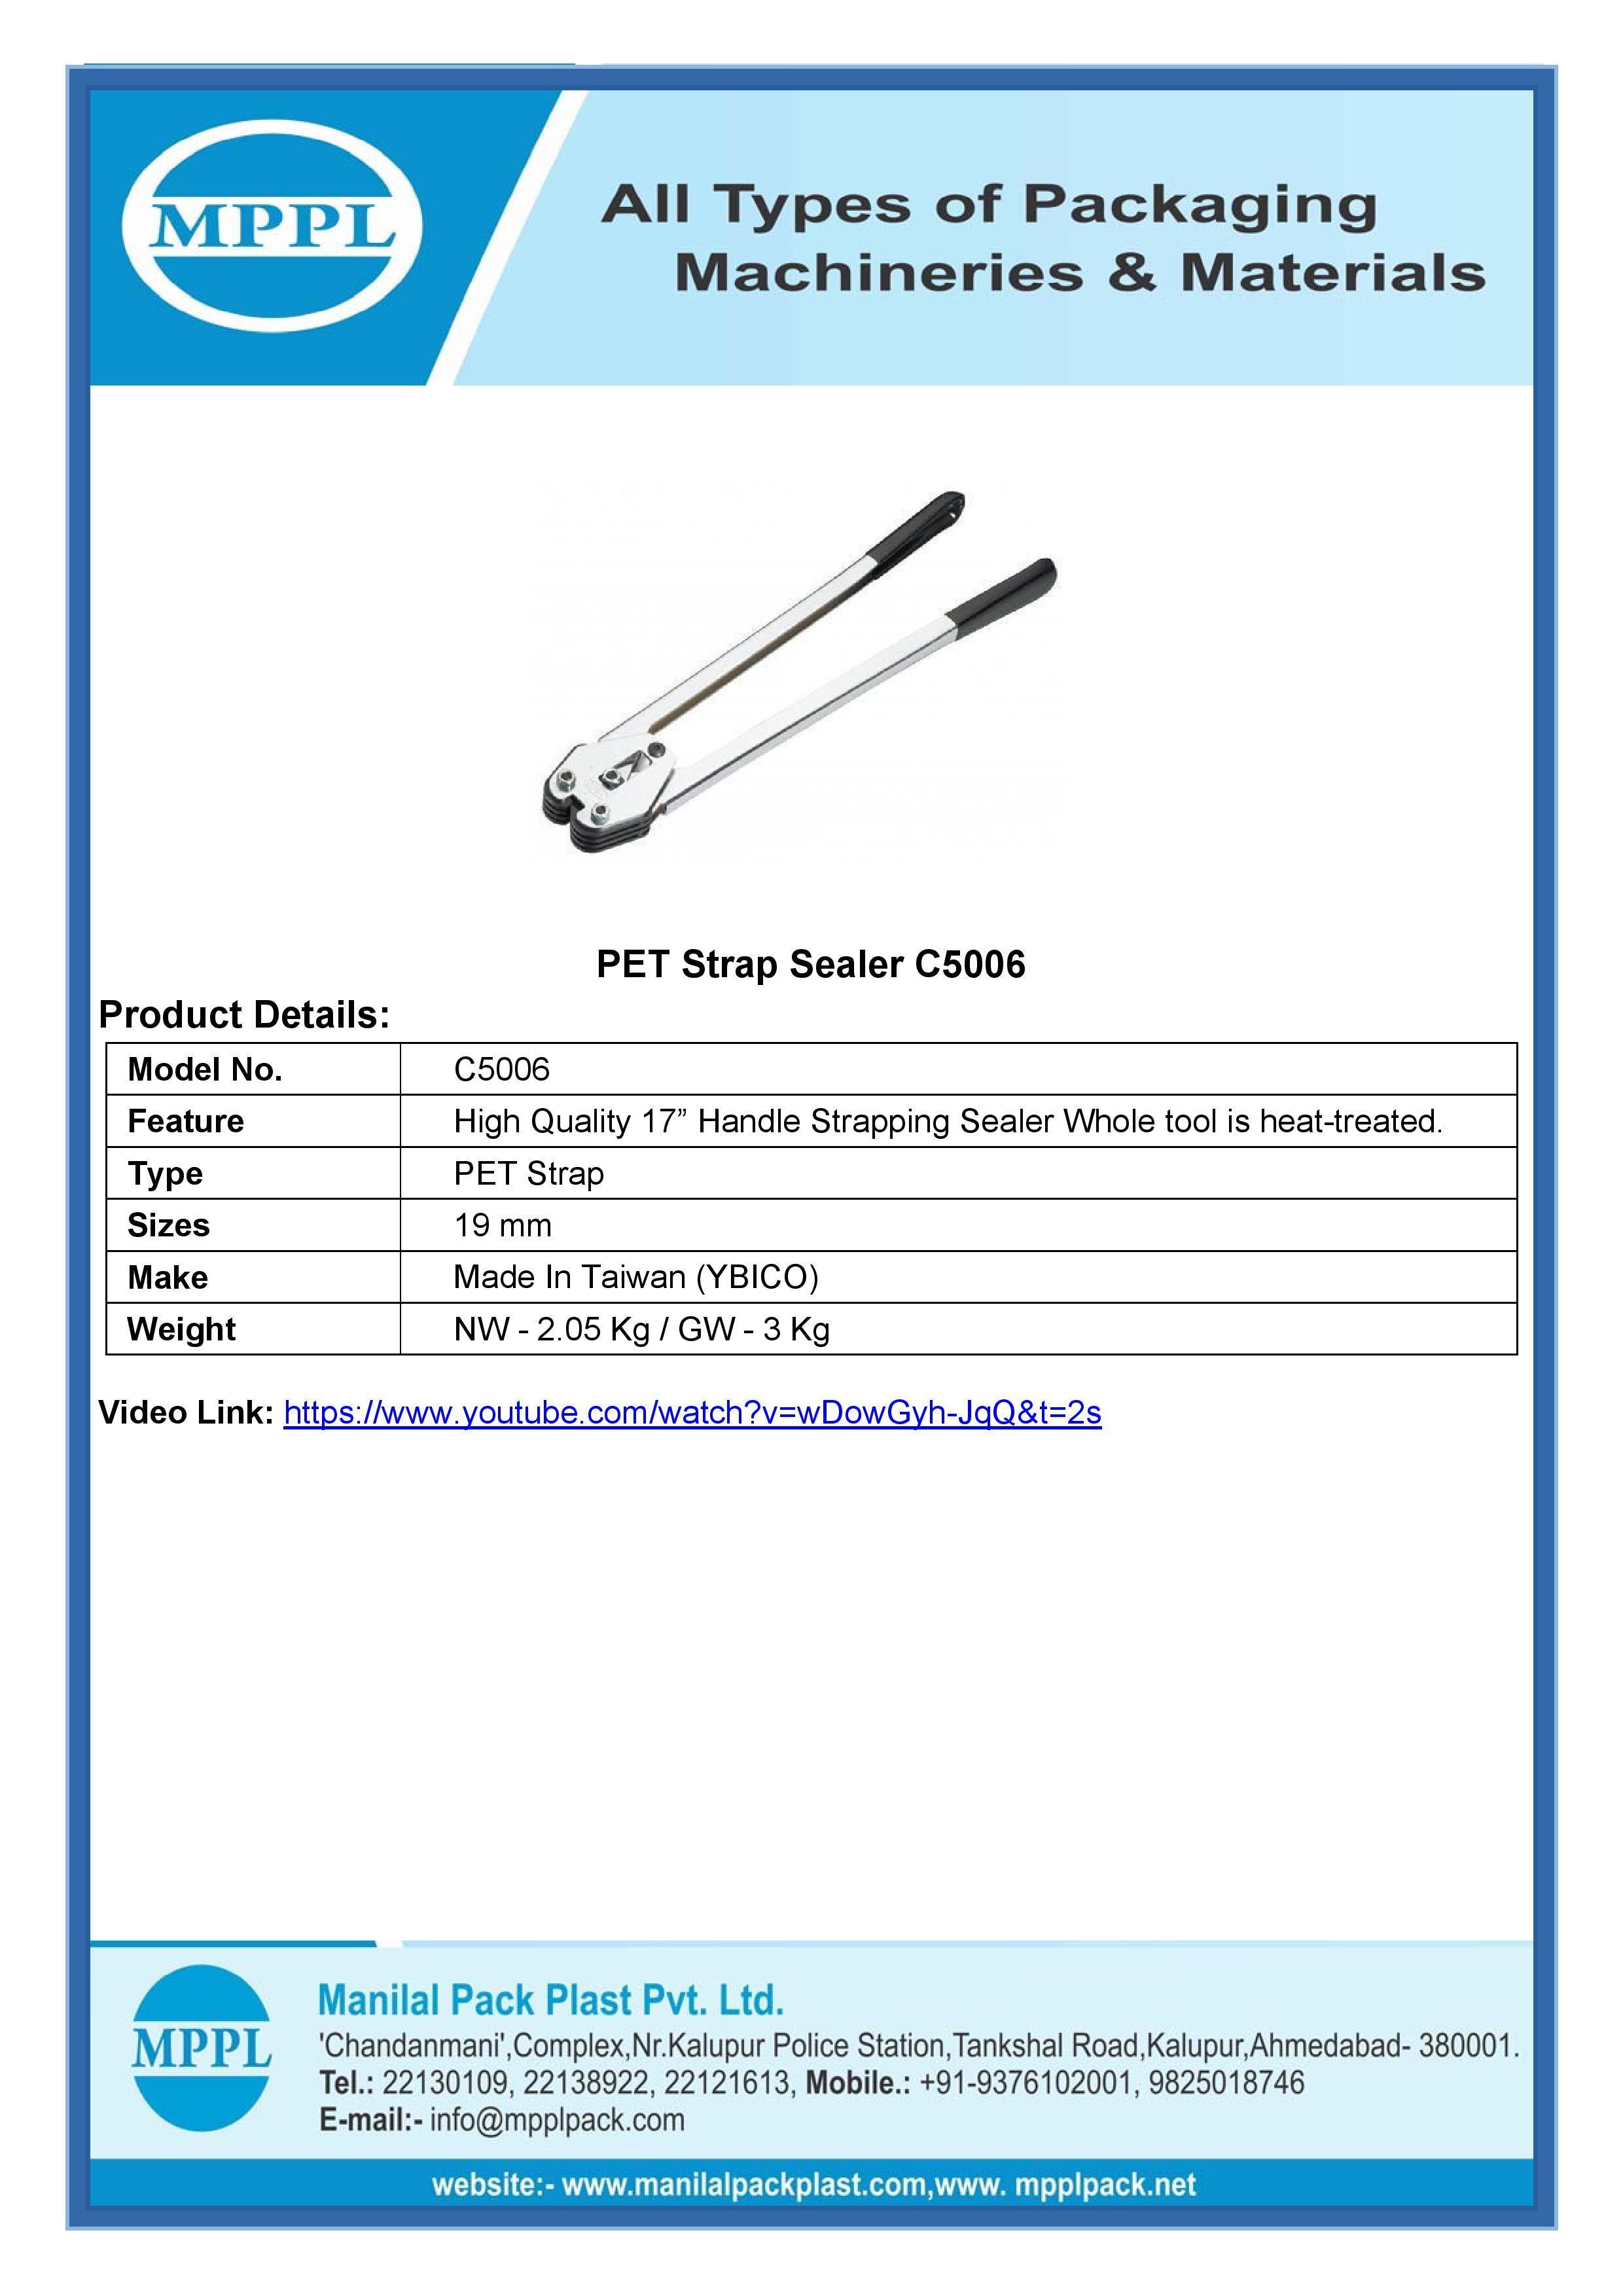 PET Strap Sealer C5006